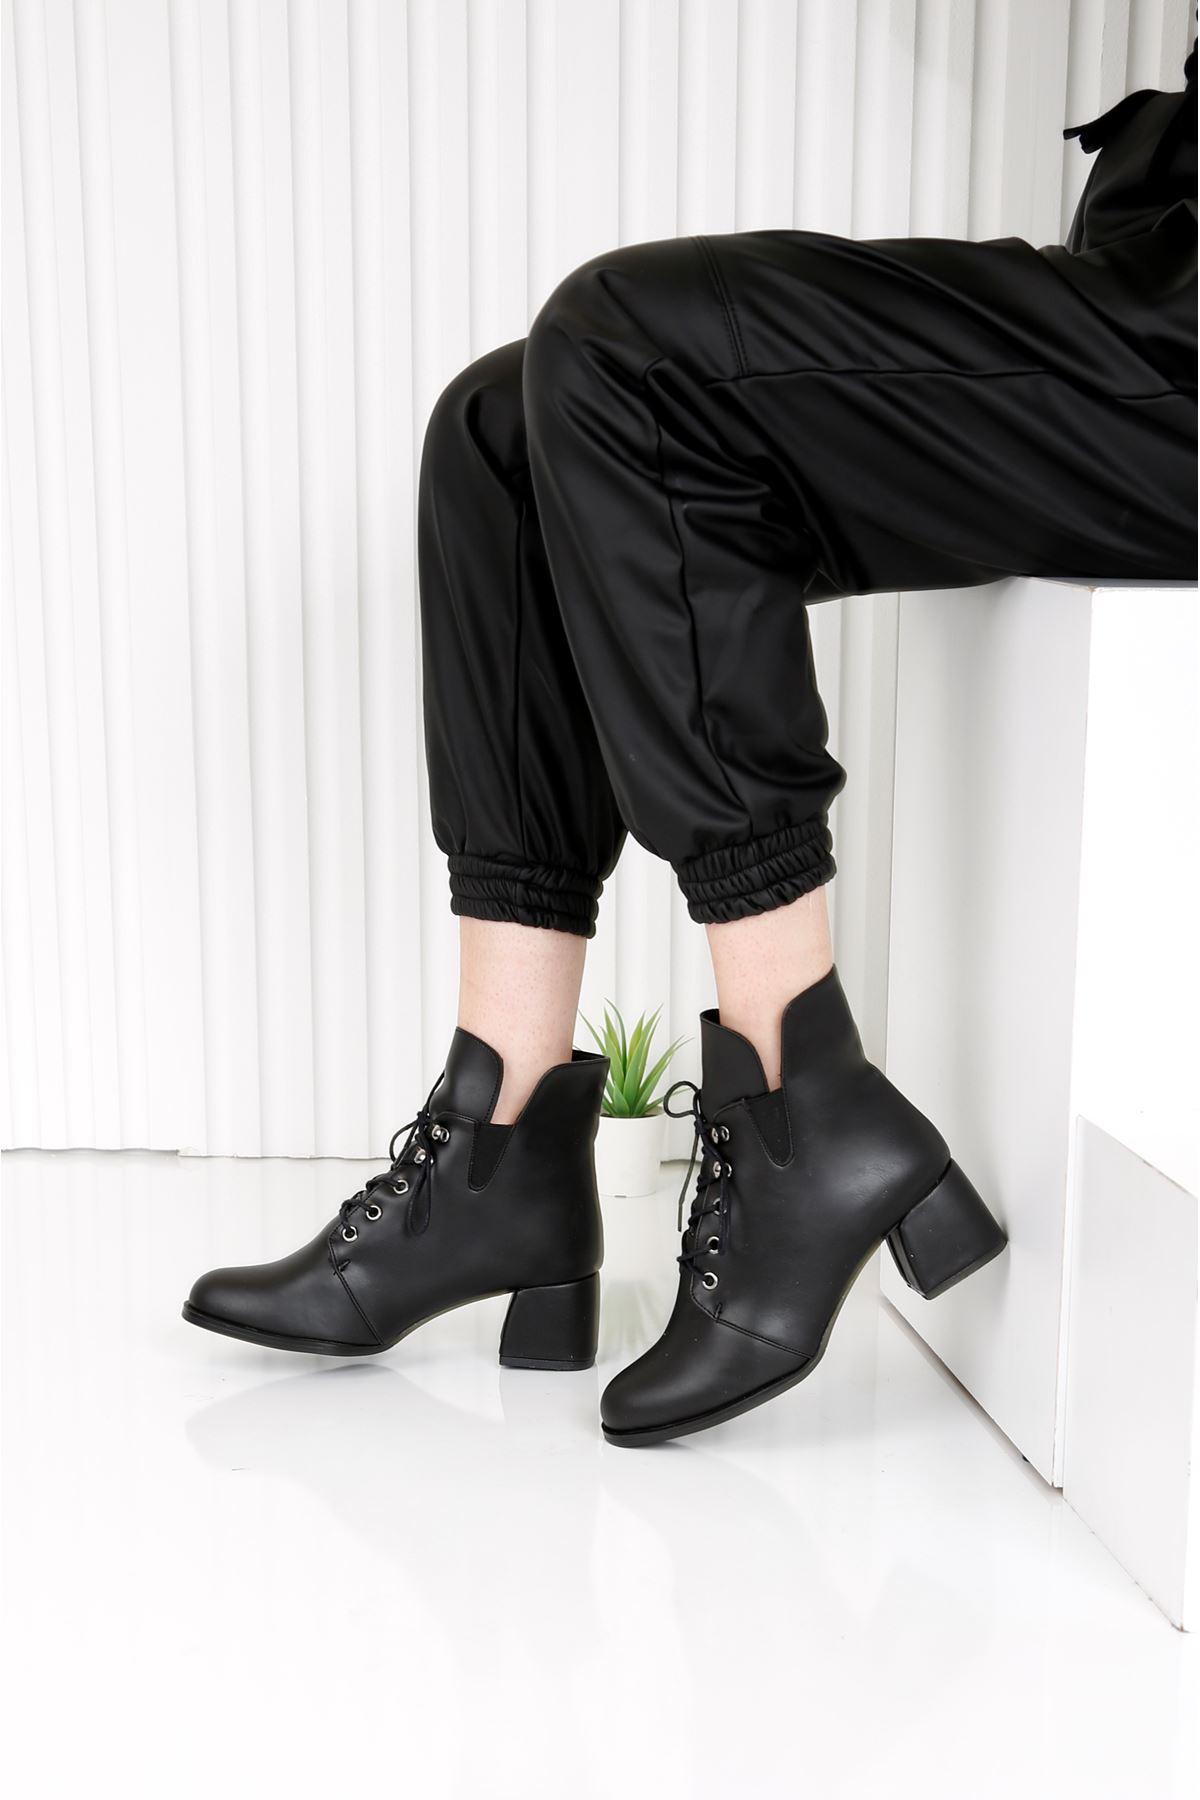 TRAUM Siyah Topuklu Kadın Bot